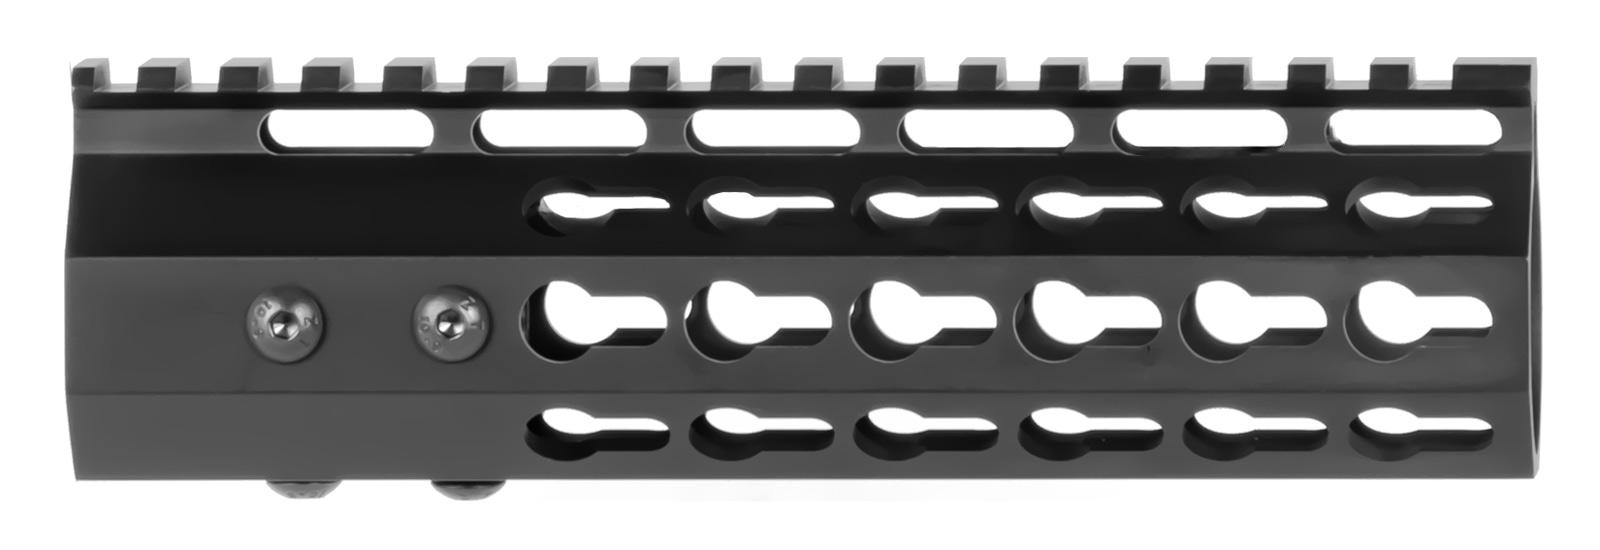 ar-15-rail-7-cbc-arms-keymod-gen-2-ar-15-handguard-rail